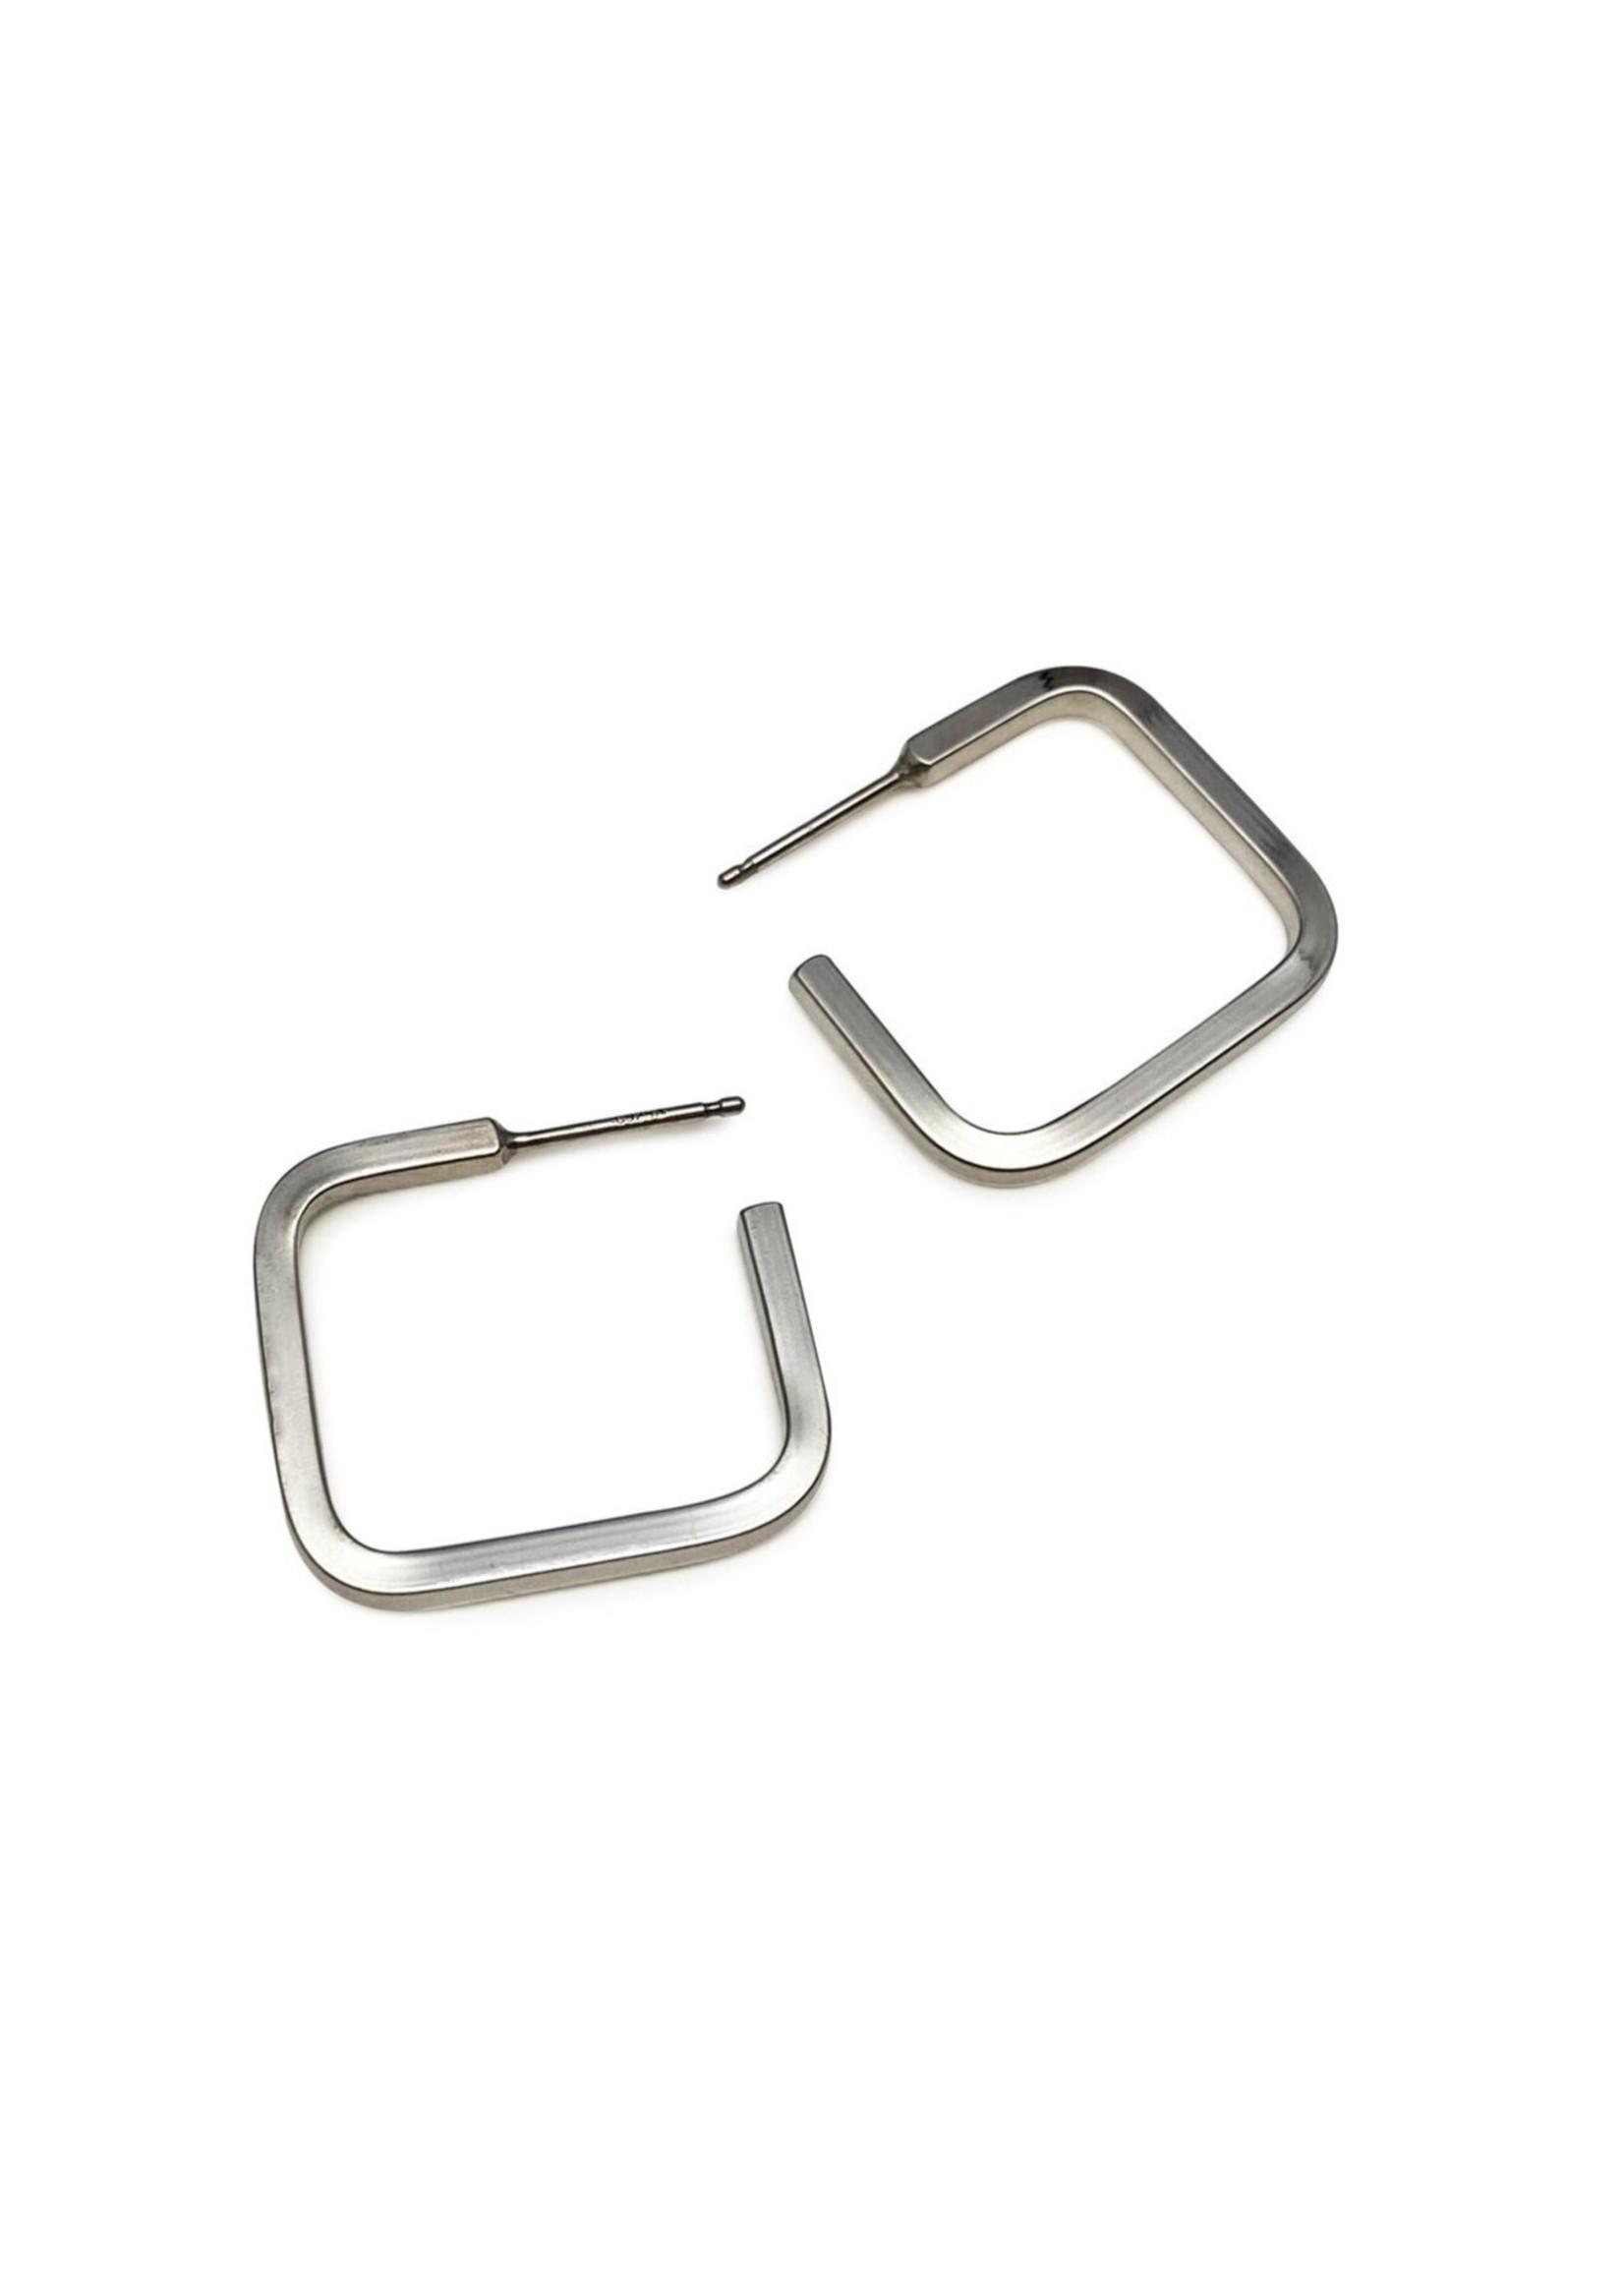 Suga Jewelry Suga Jewelry Square Hoop Earrings